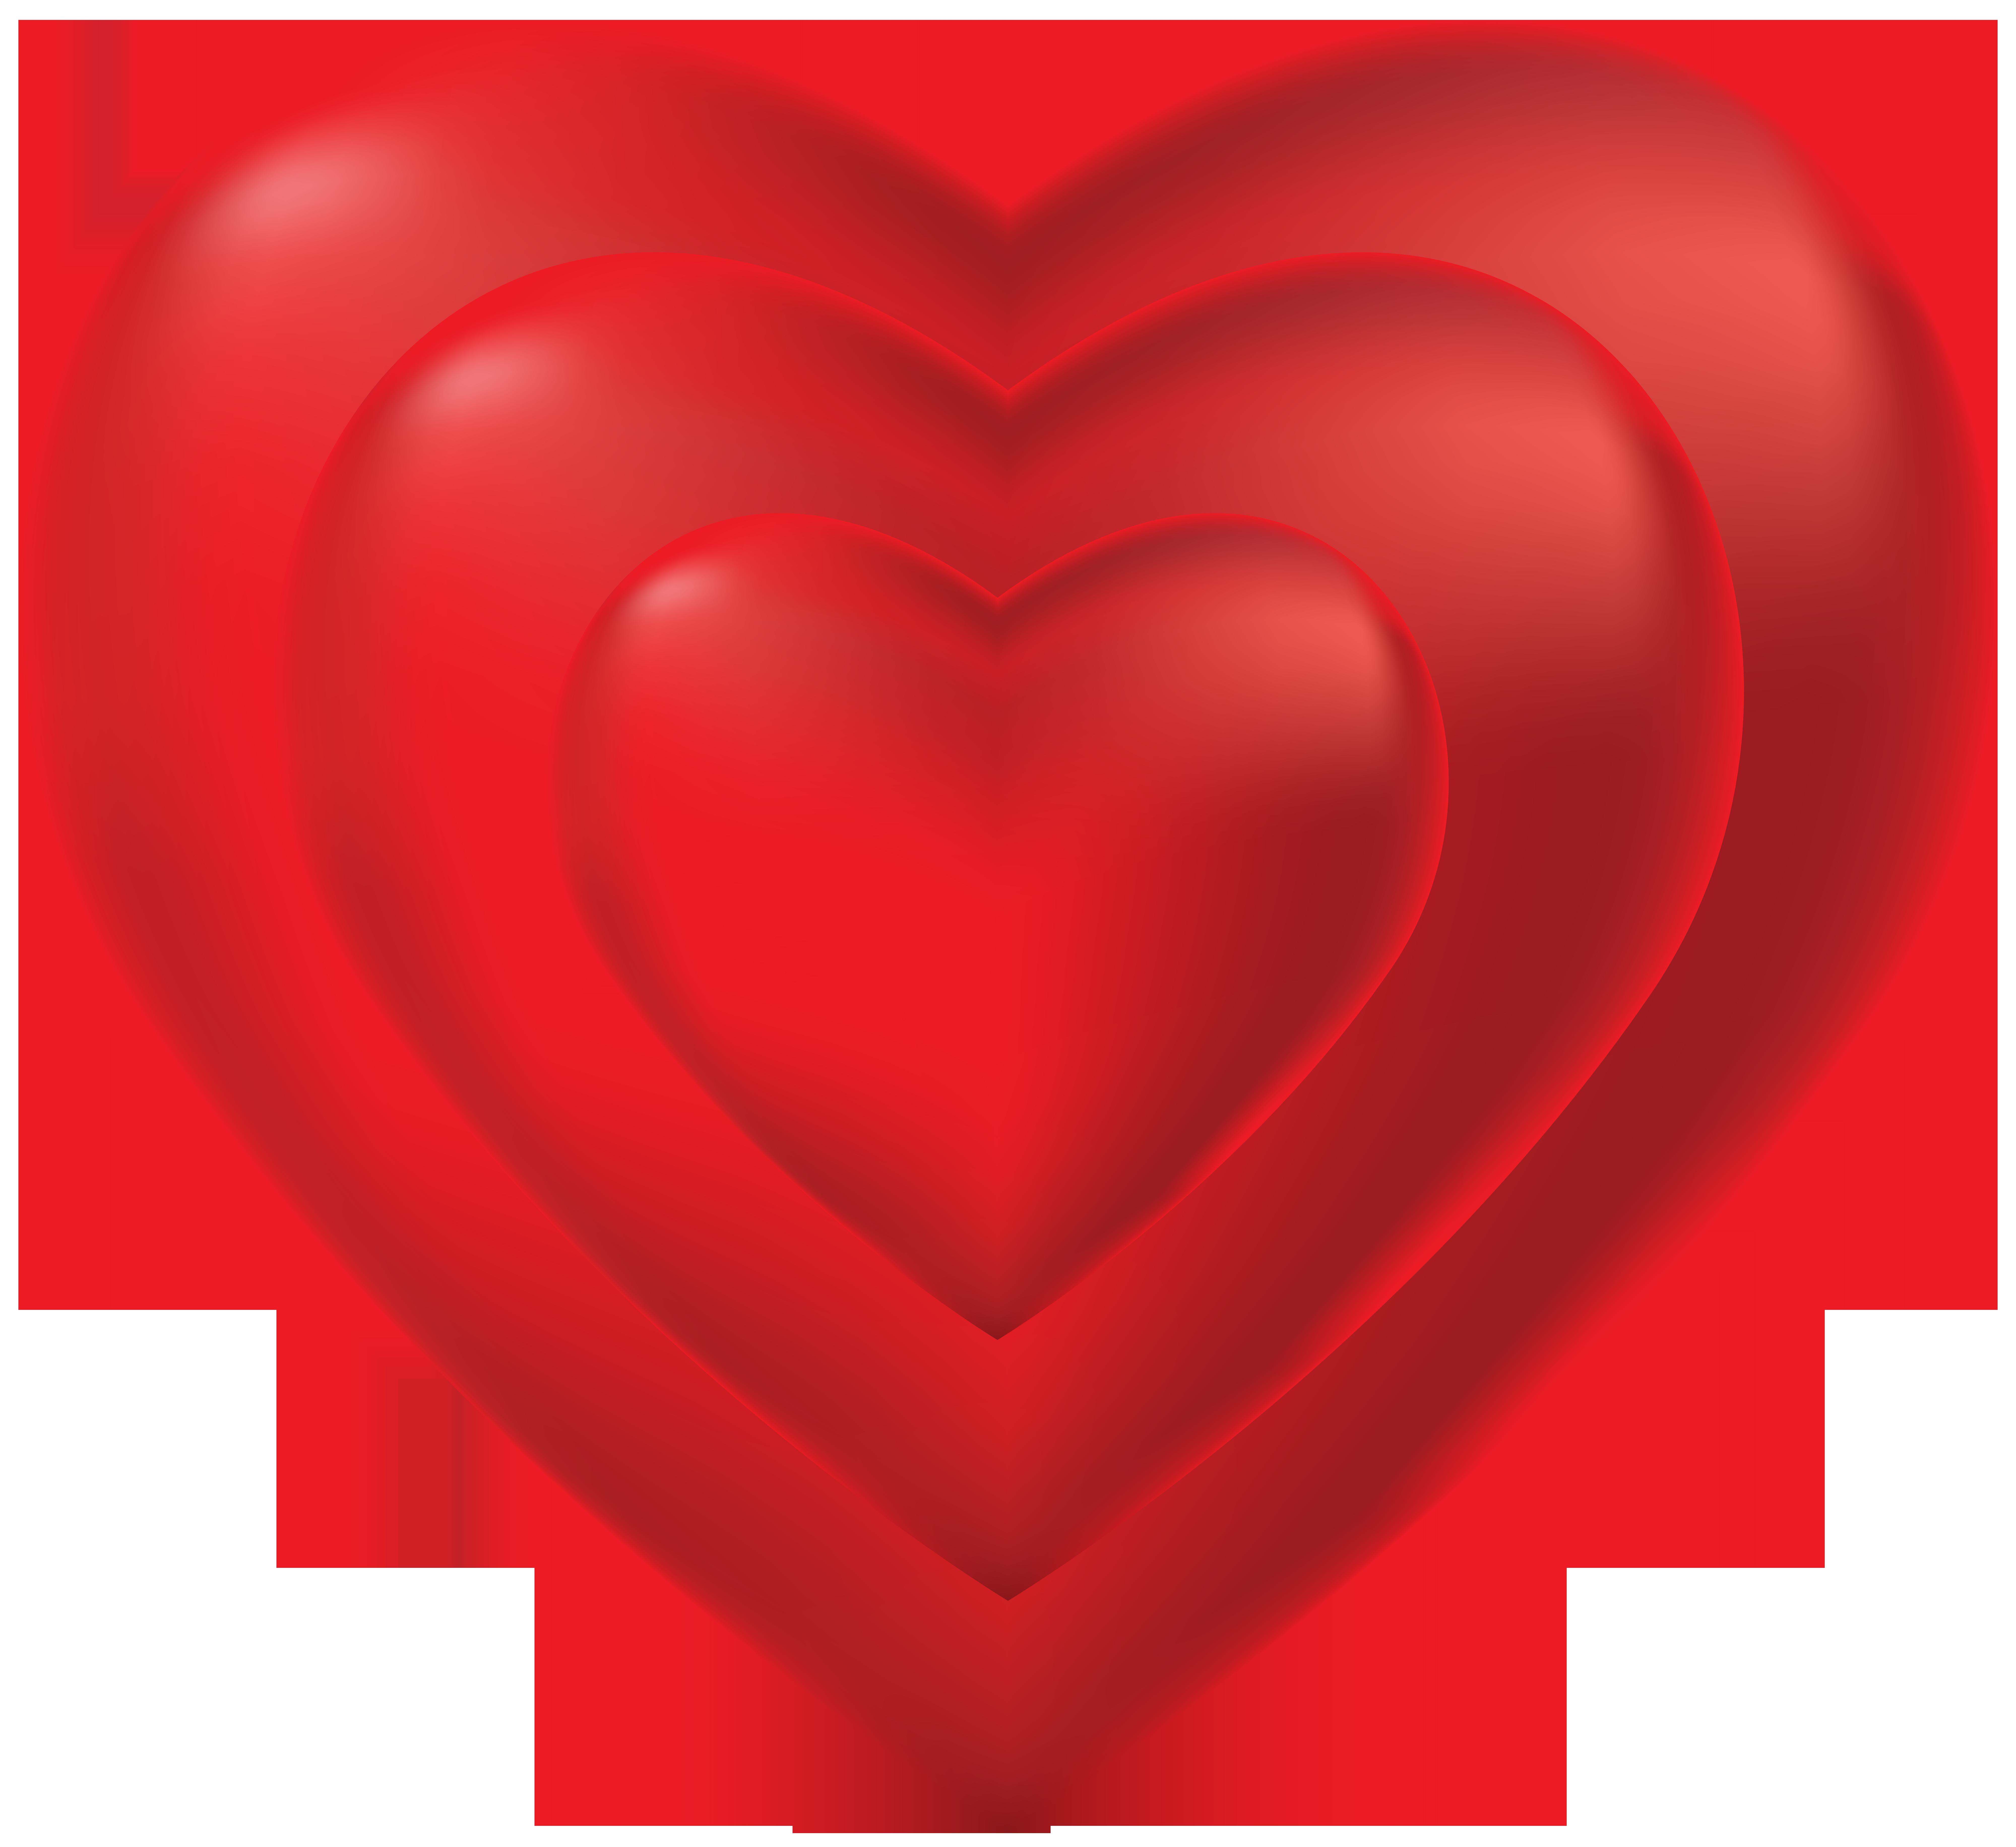 Heart transparent png clip. Clipart summer body